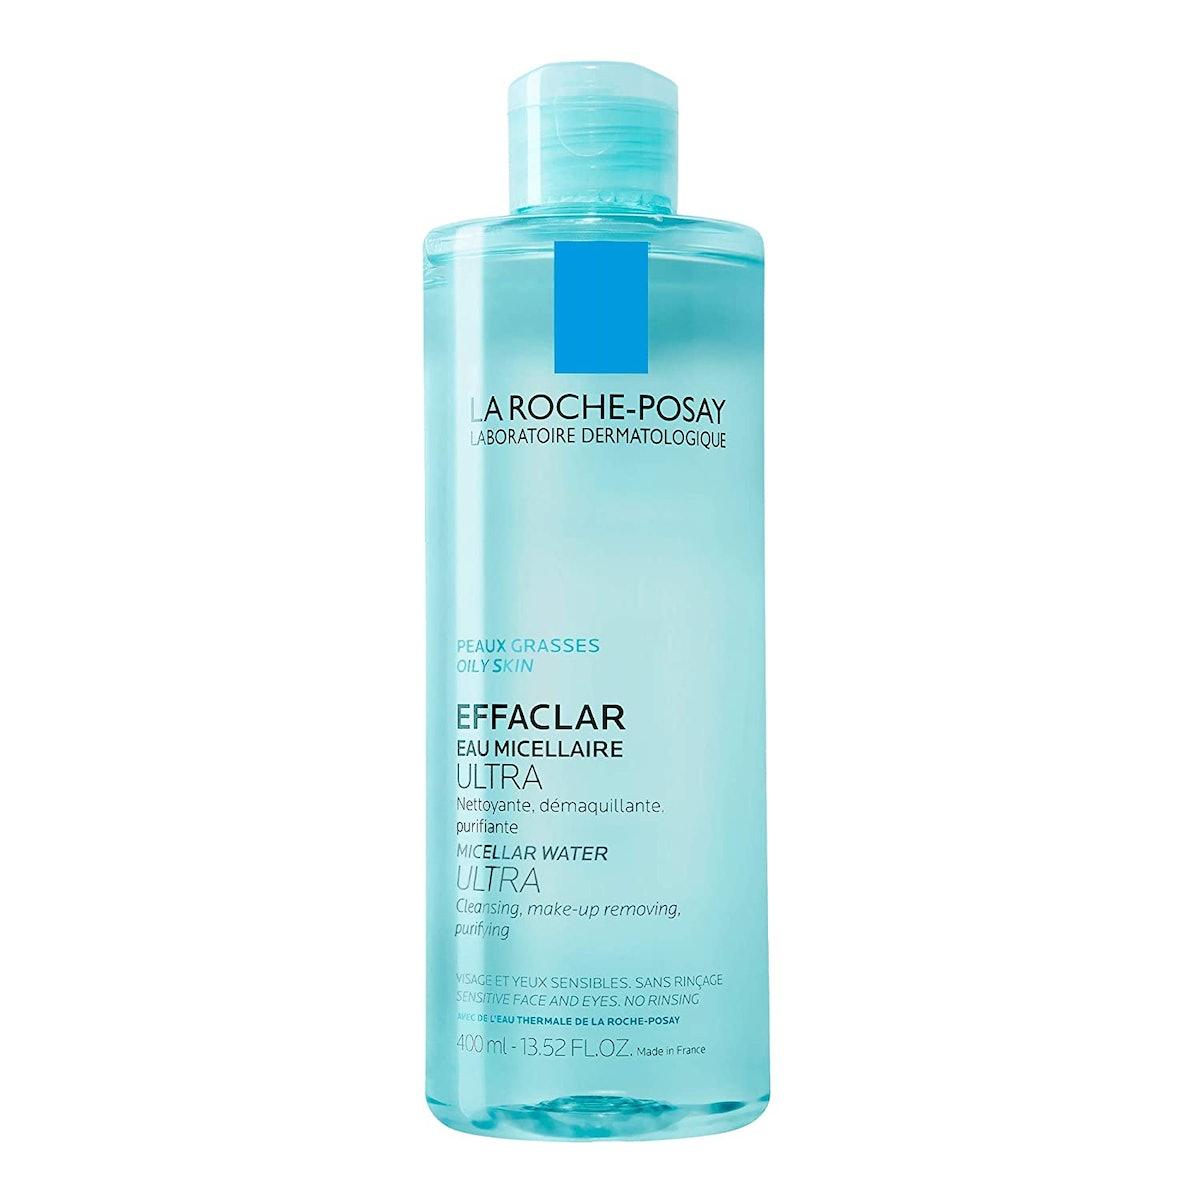 La Roche-Posay Effaclar Micellar Water For Oily Skin